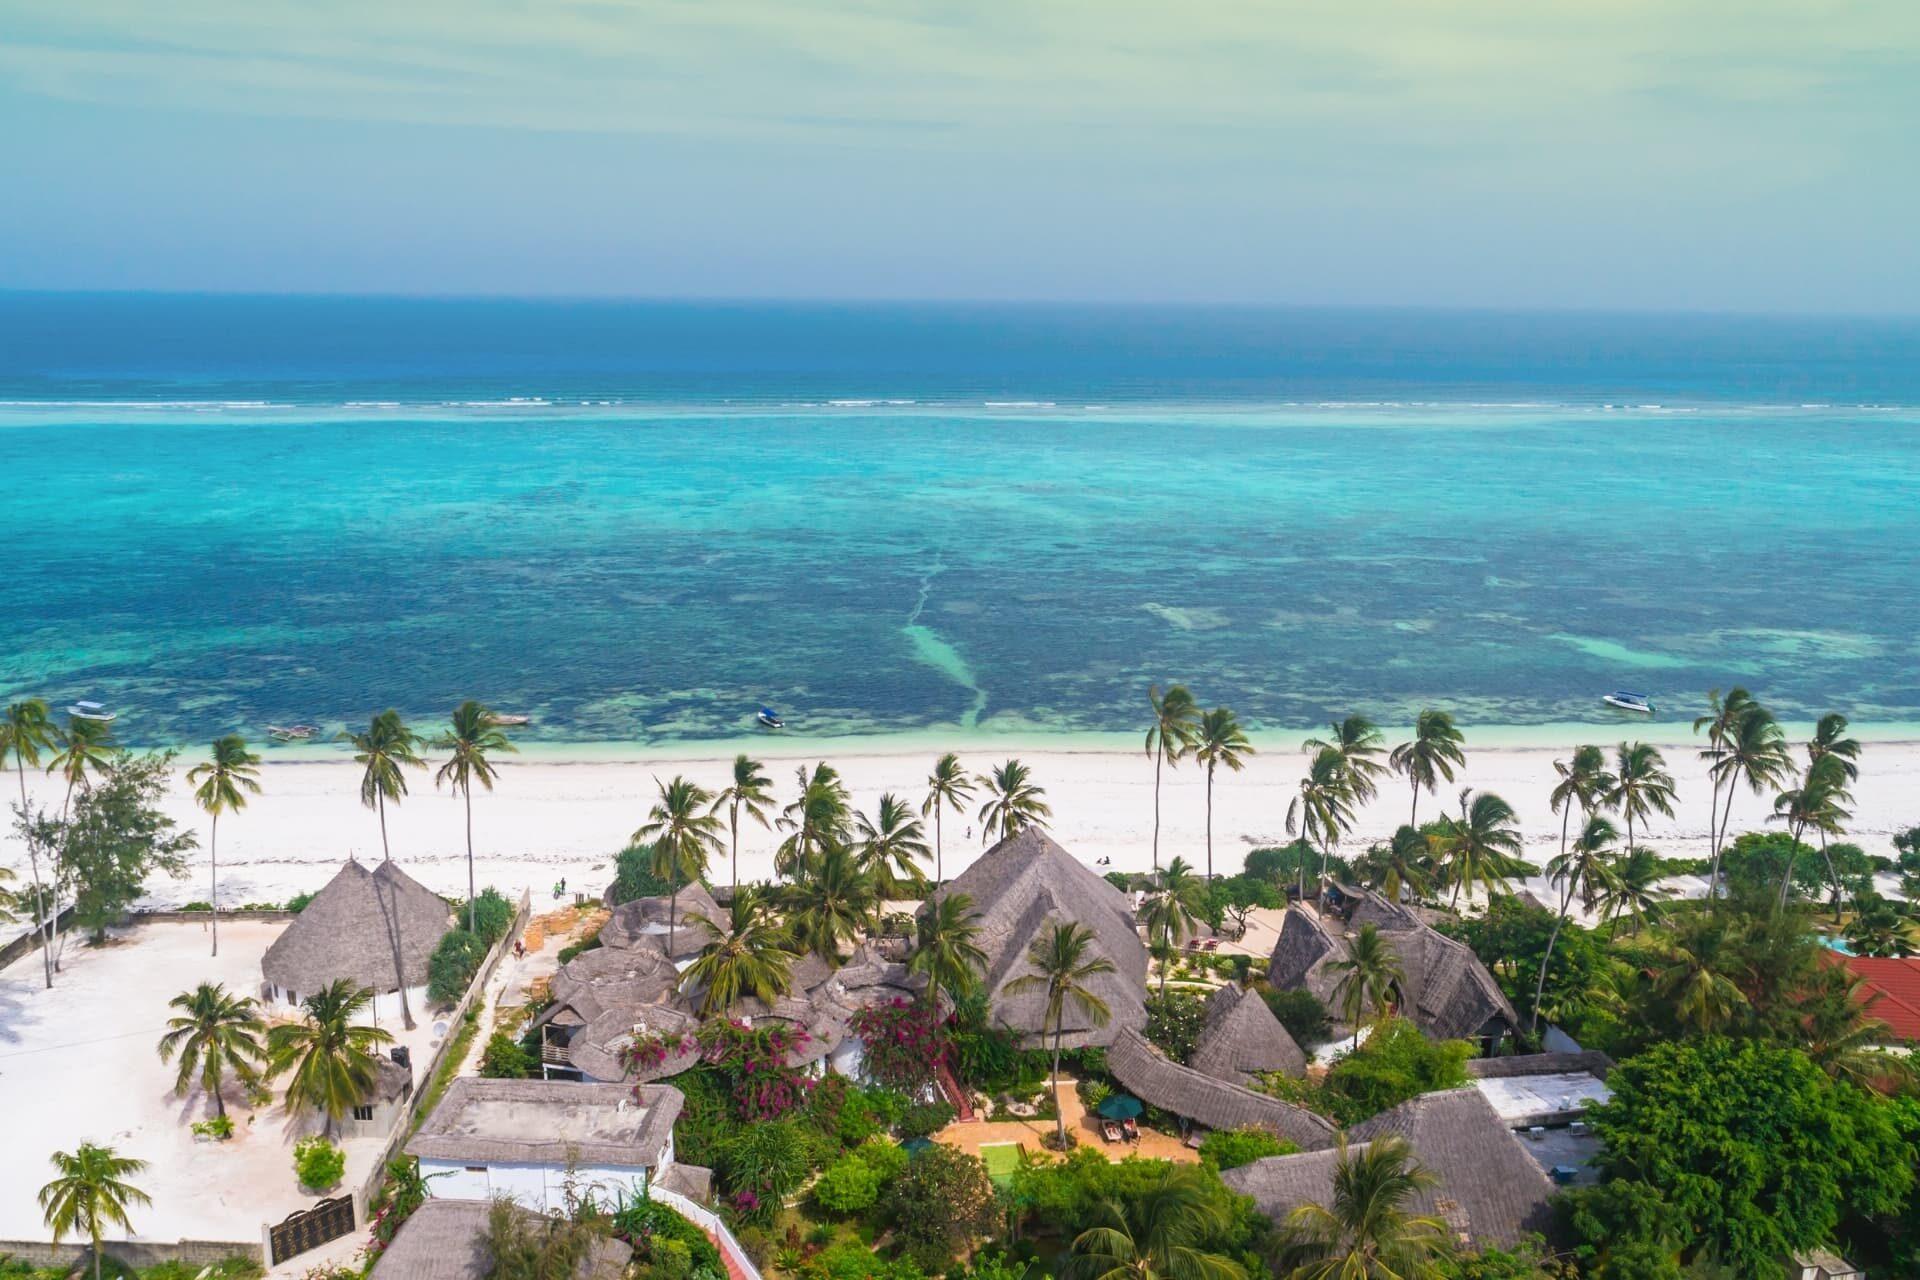 Lifetrek treking potovanja: Tanzanija in Zanzibar